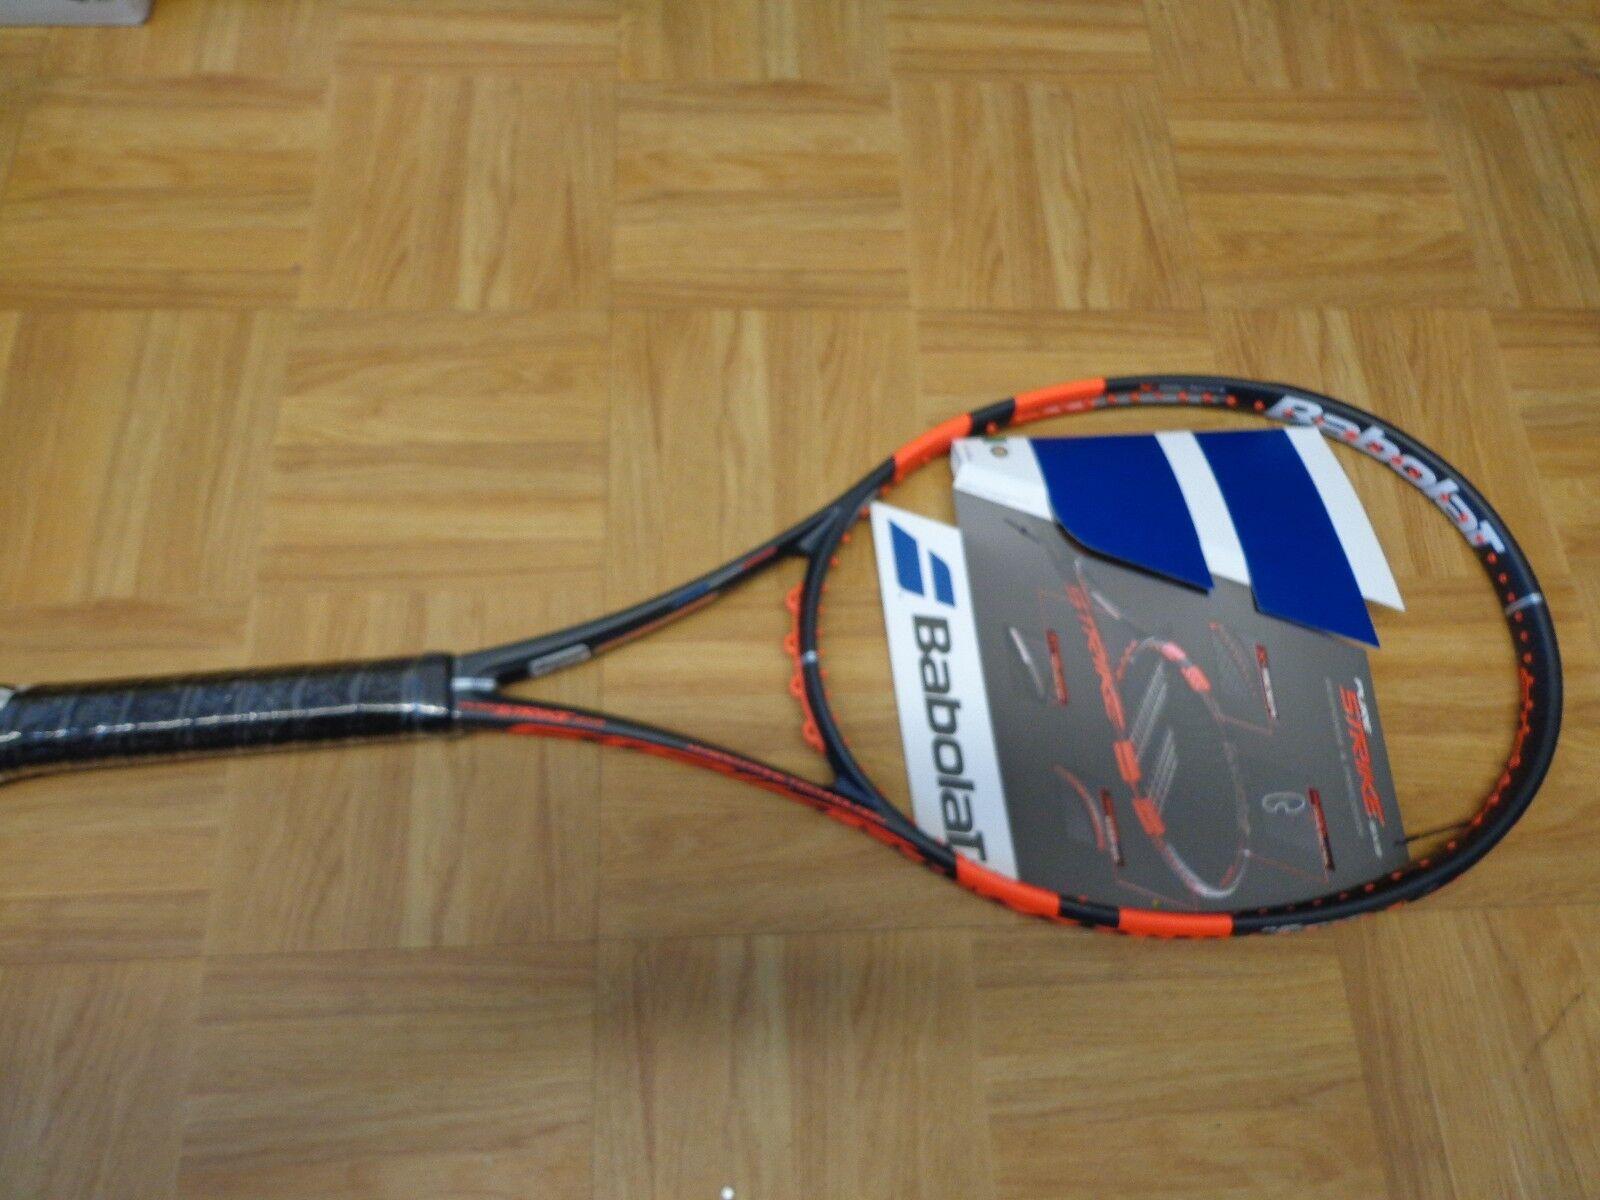 NEW Babolat Pure Pure Pure Strike TOUR 98 head 18x20 11.3oz 4 1/4 grip Tennis Racquet 1caaec